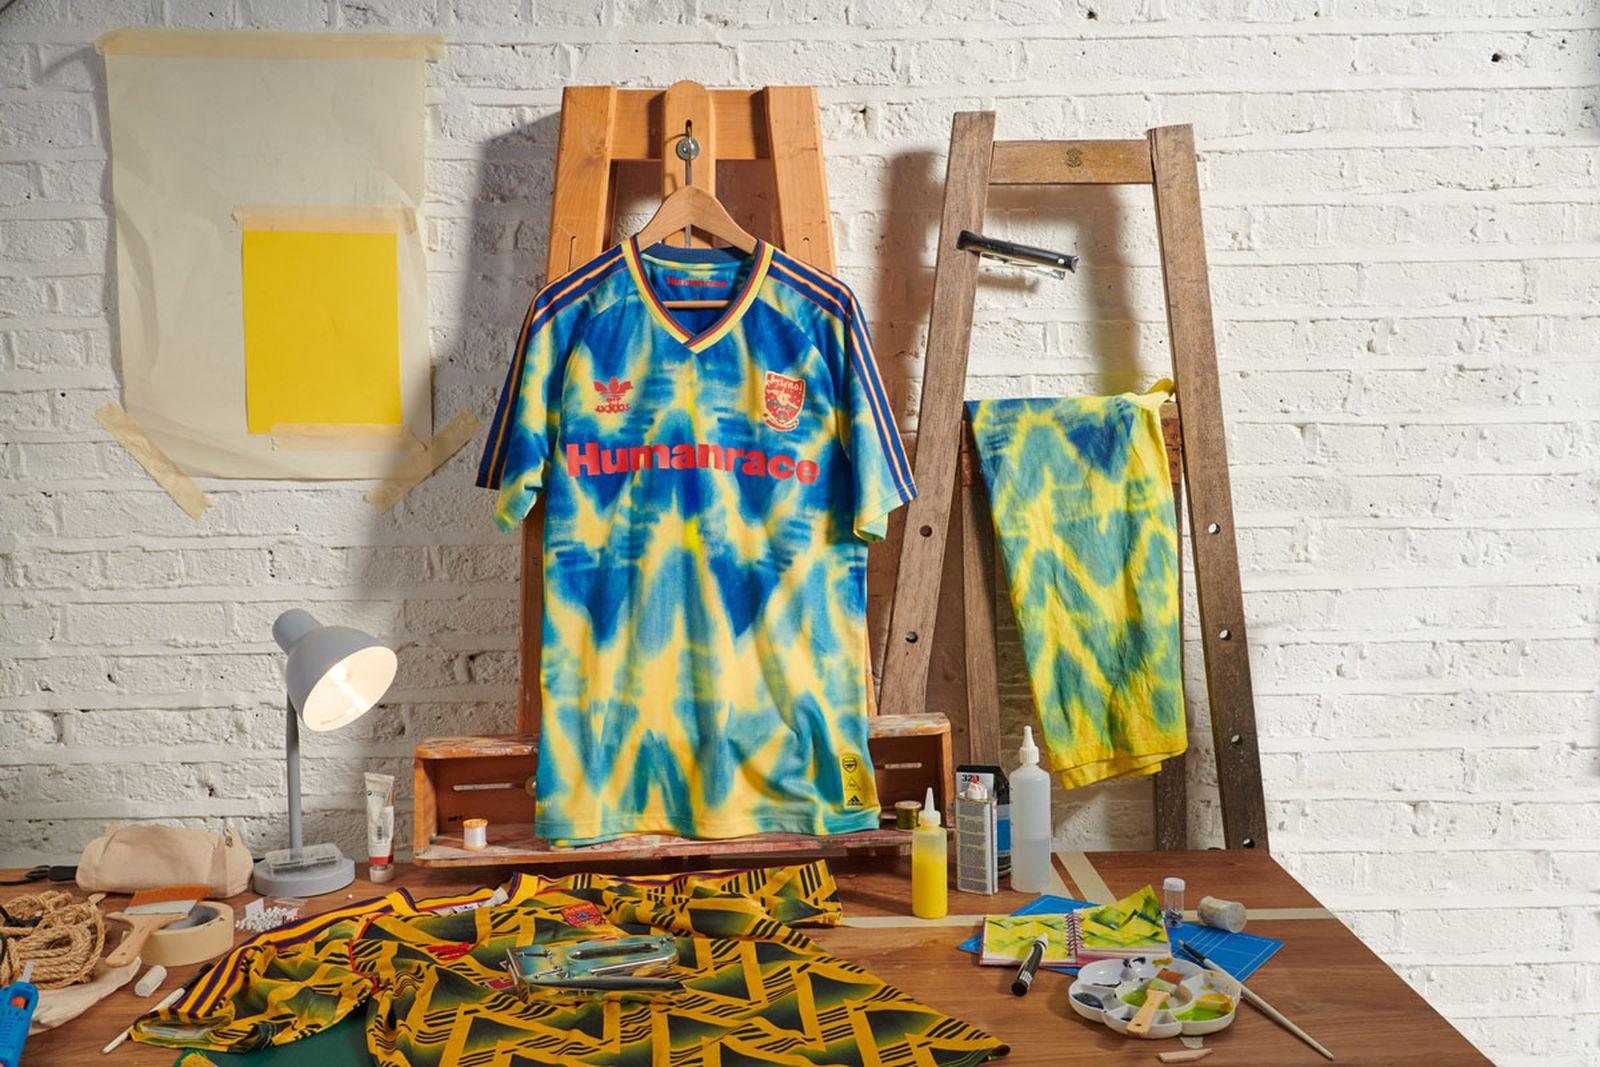 pharrell-williams-adidas-human-race-jerseys-buy-now-02